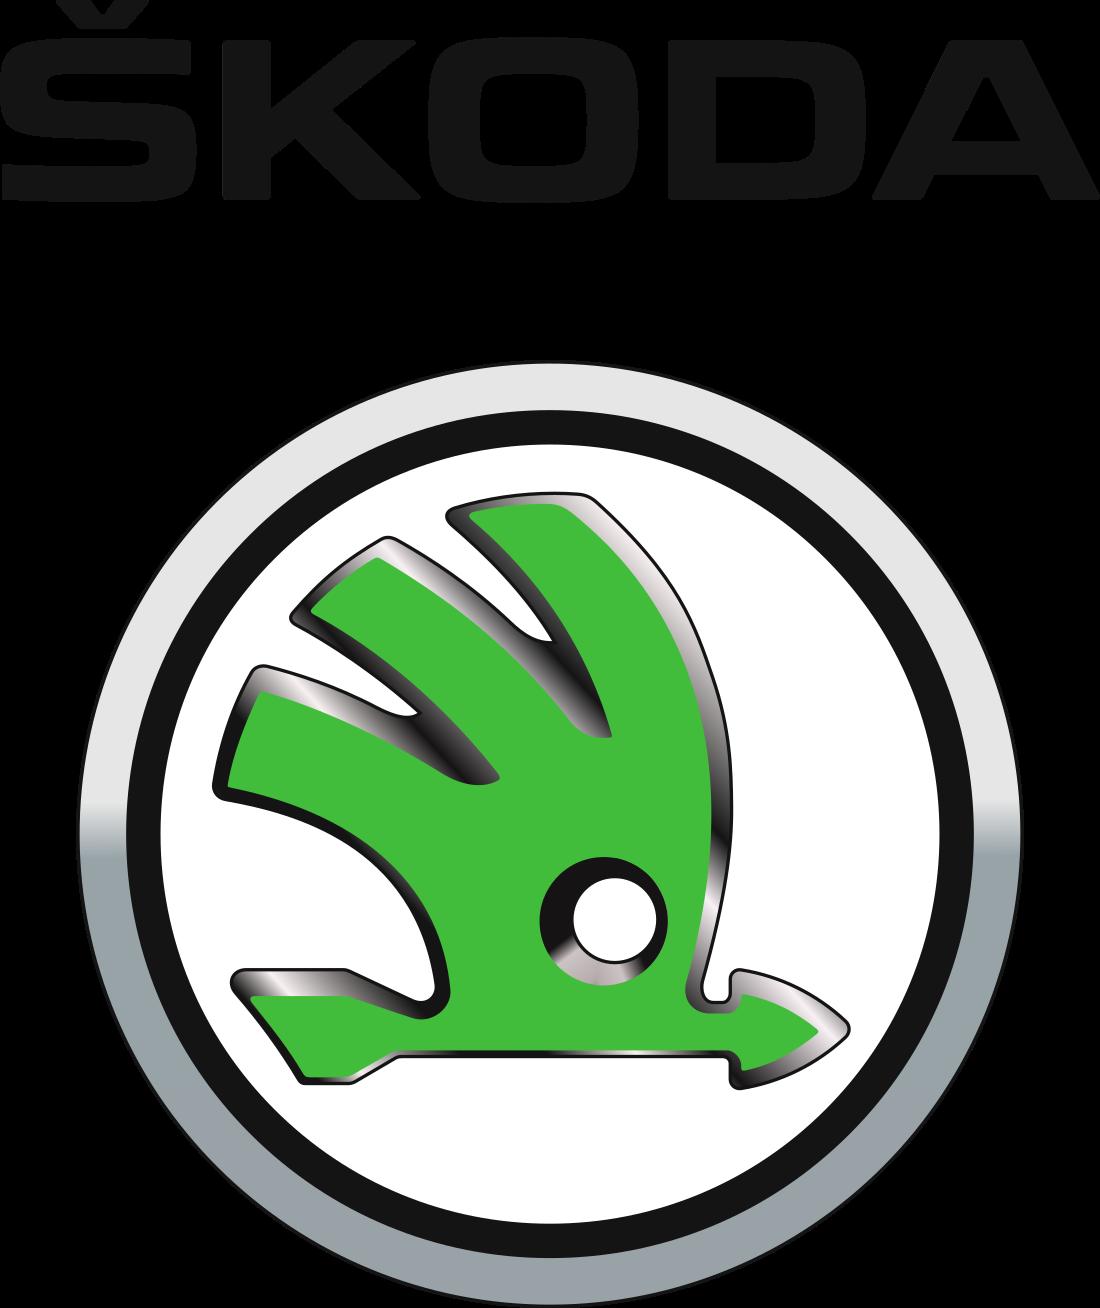 skoda-auto-logo-7